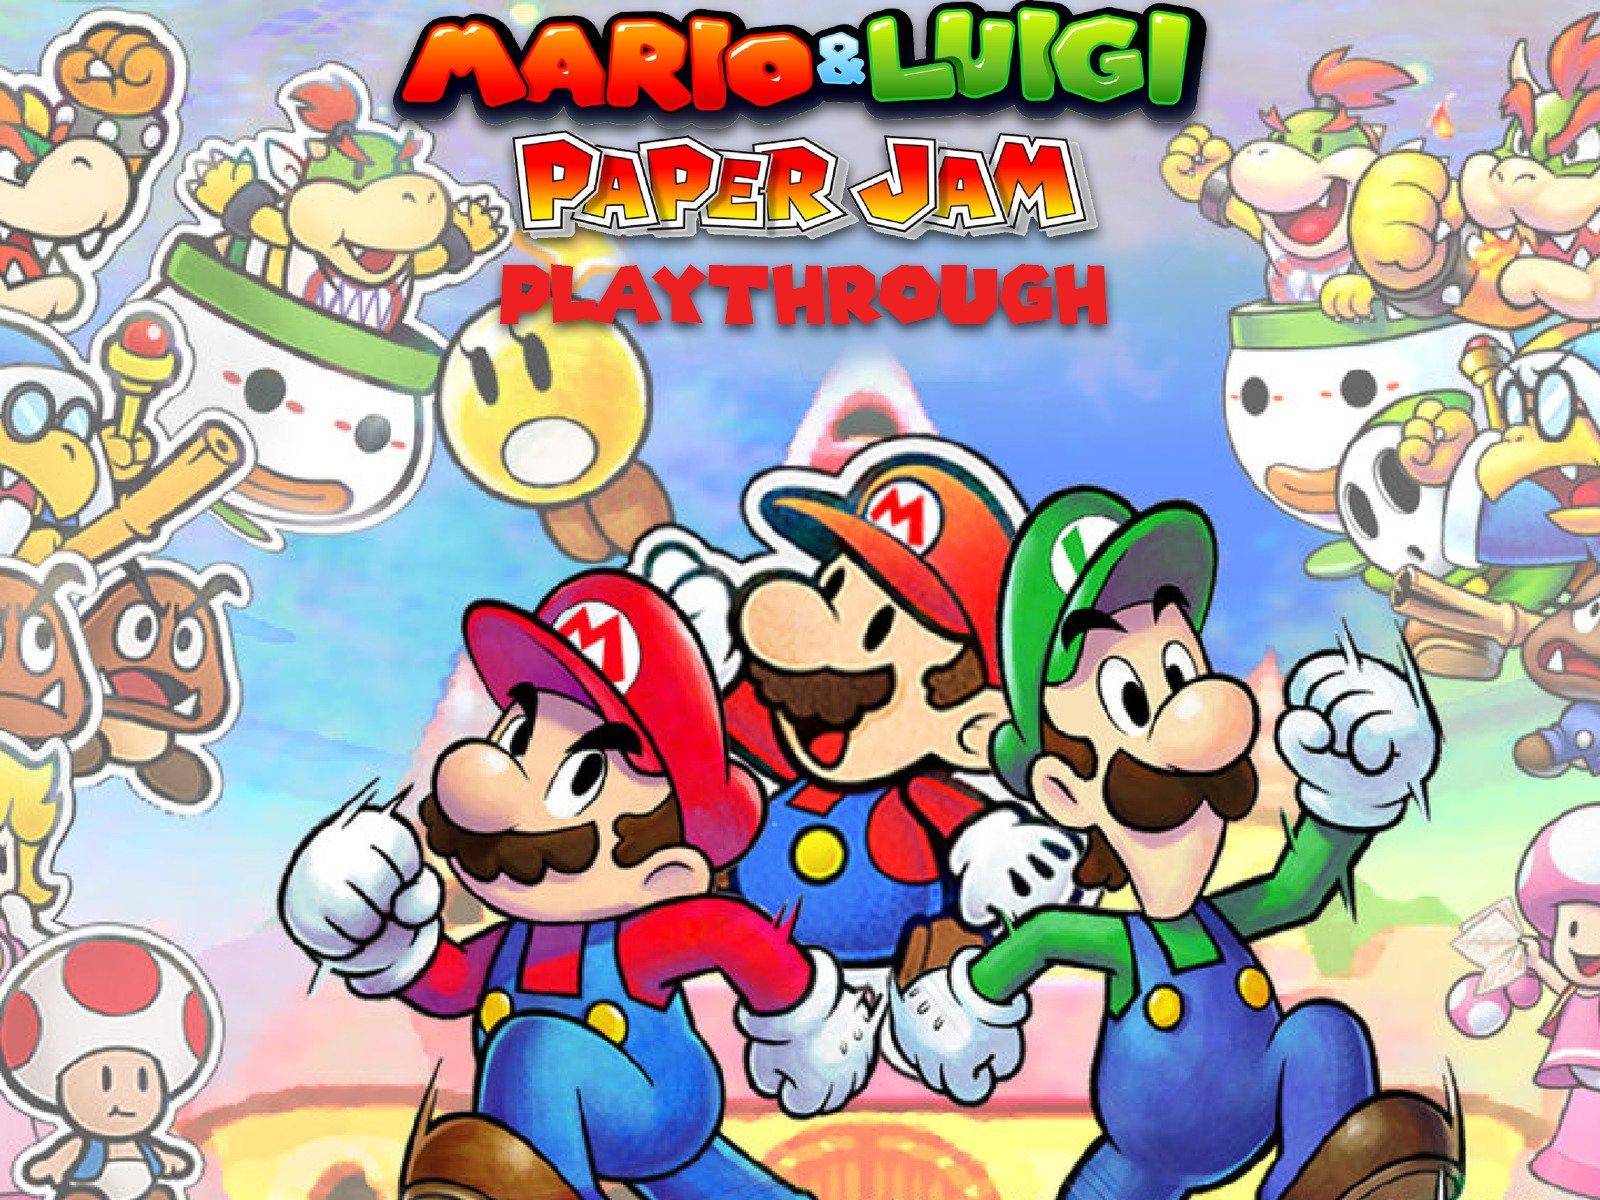 Clip: Mario & Luigi Paper Jam Playthrough - Season 1